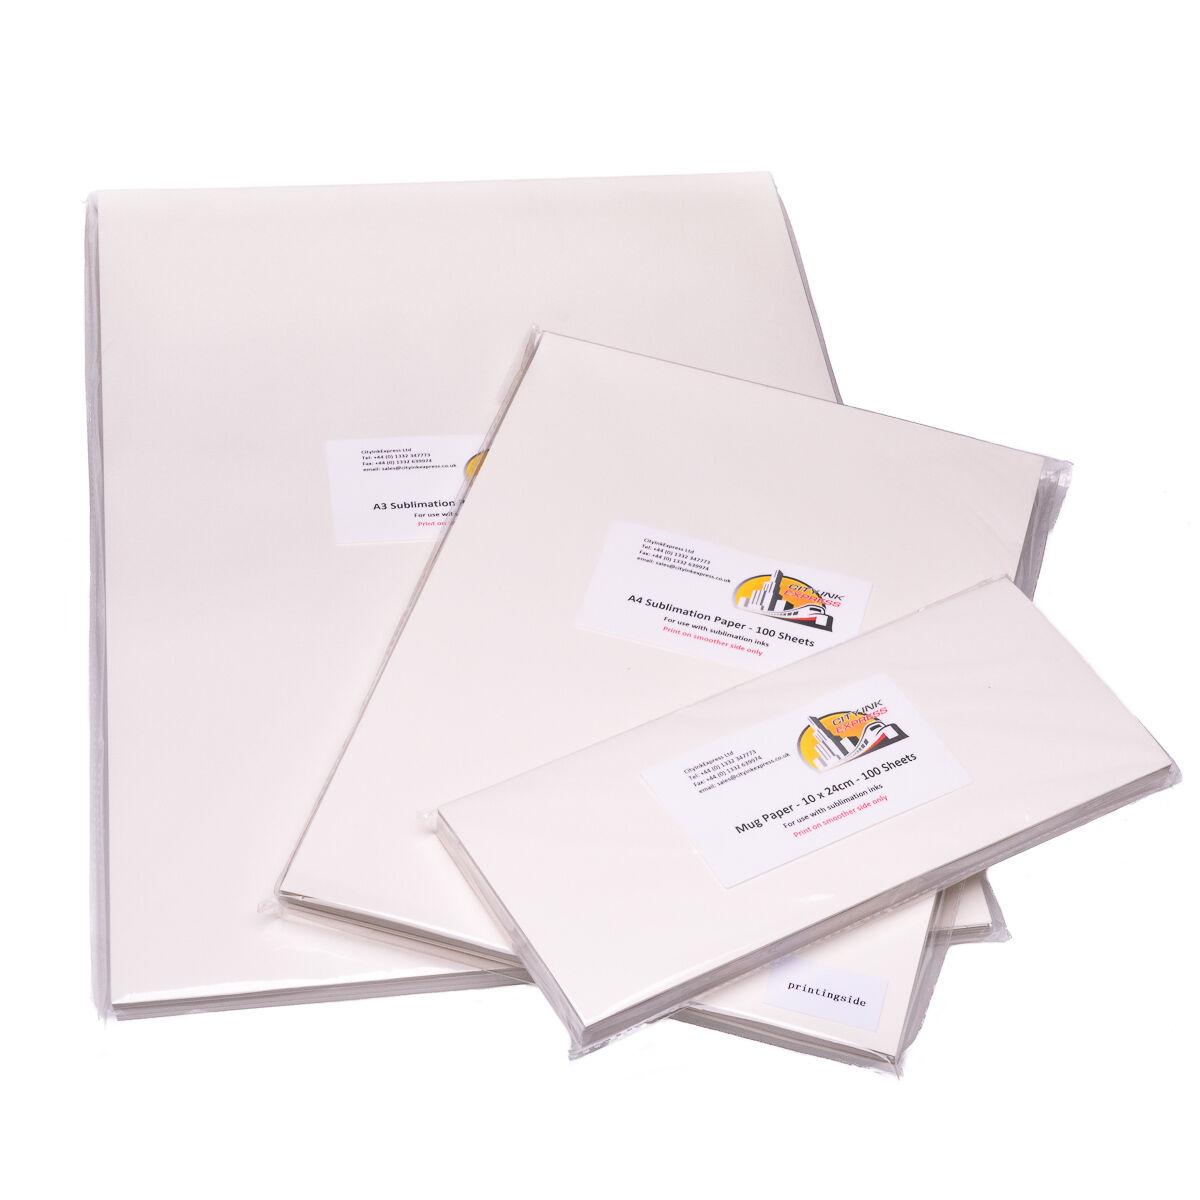 Dye Sublimation Paper for Epson Photo 1400SP printer